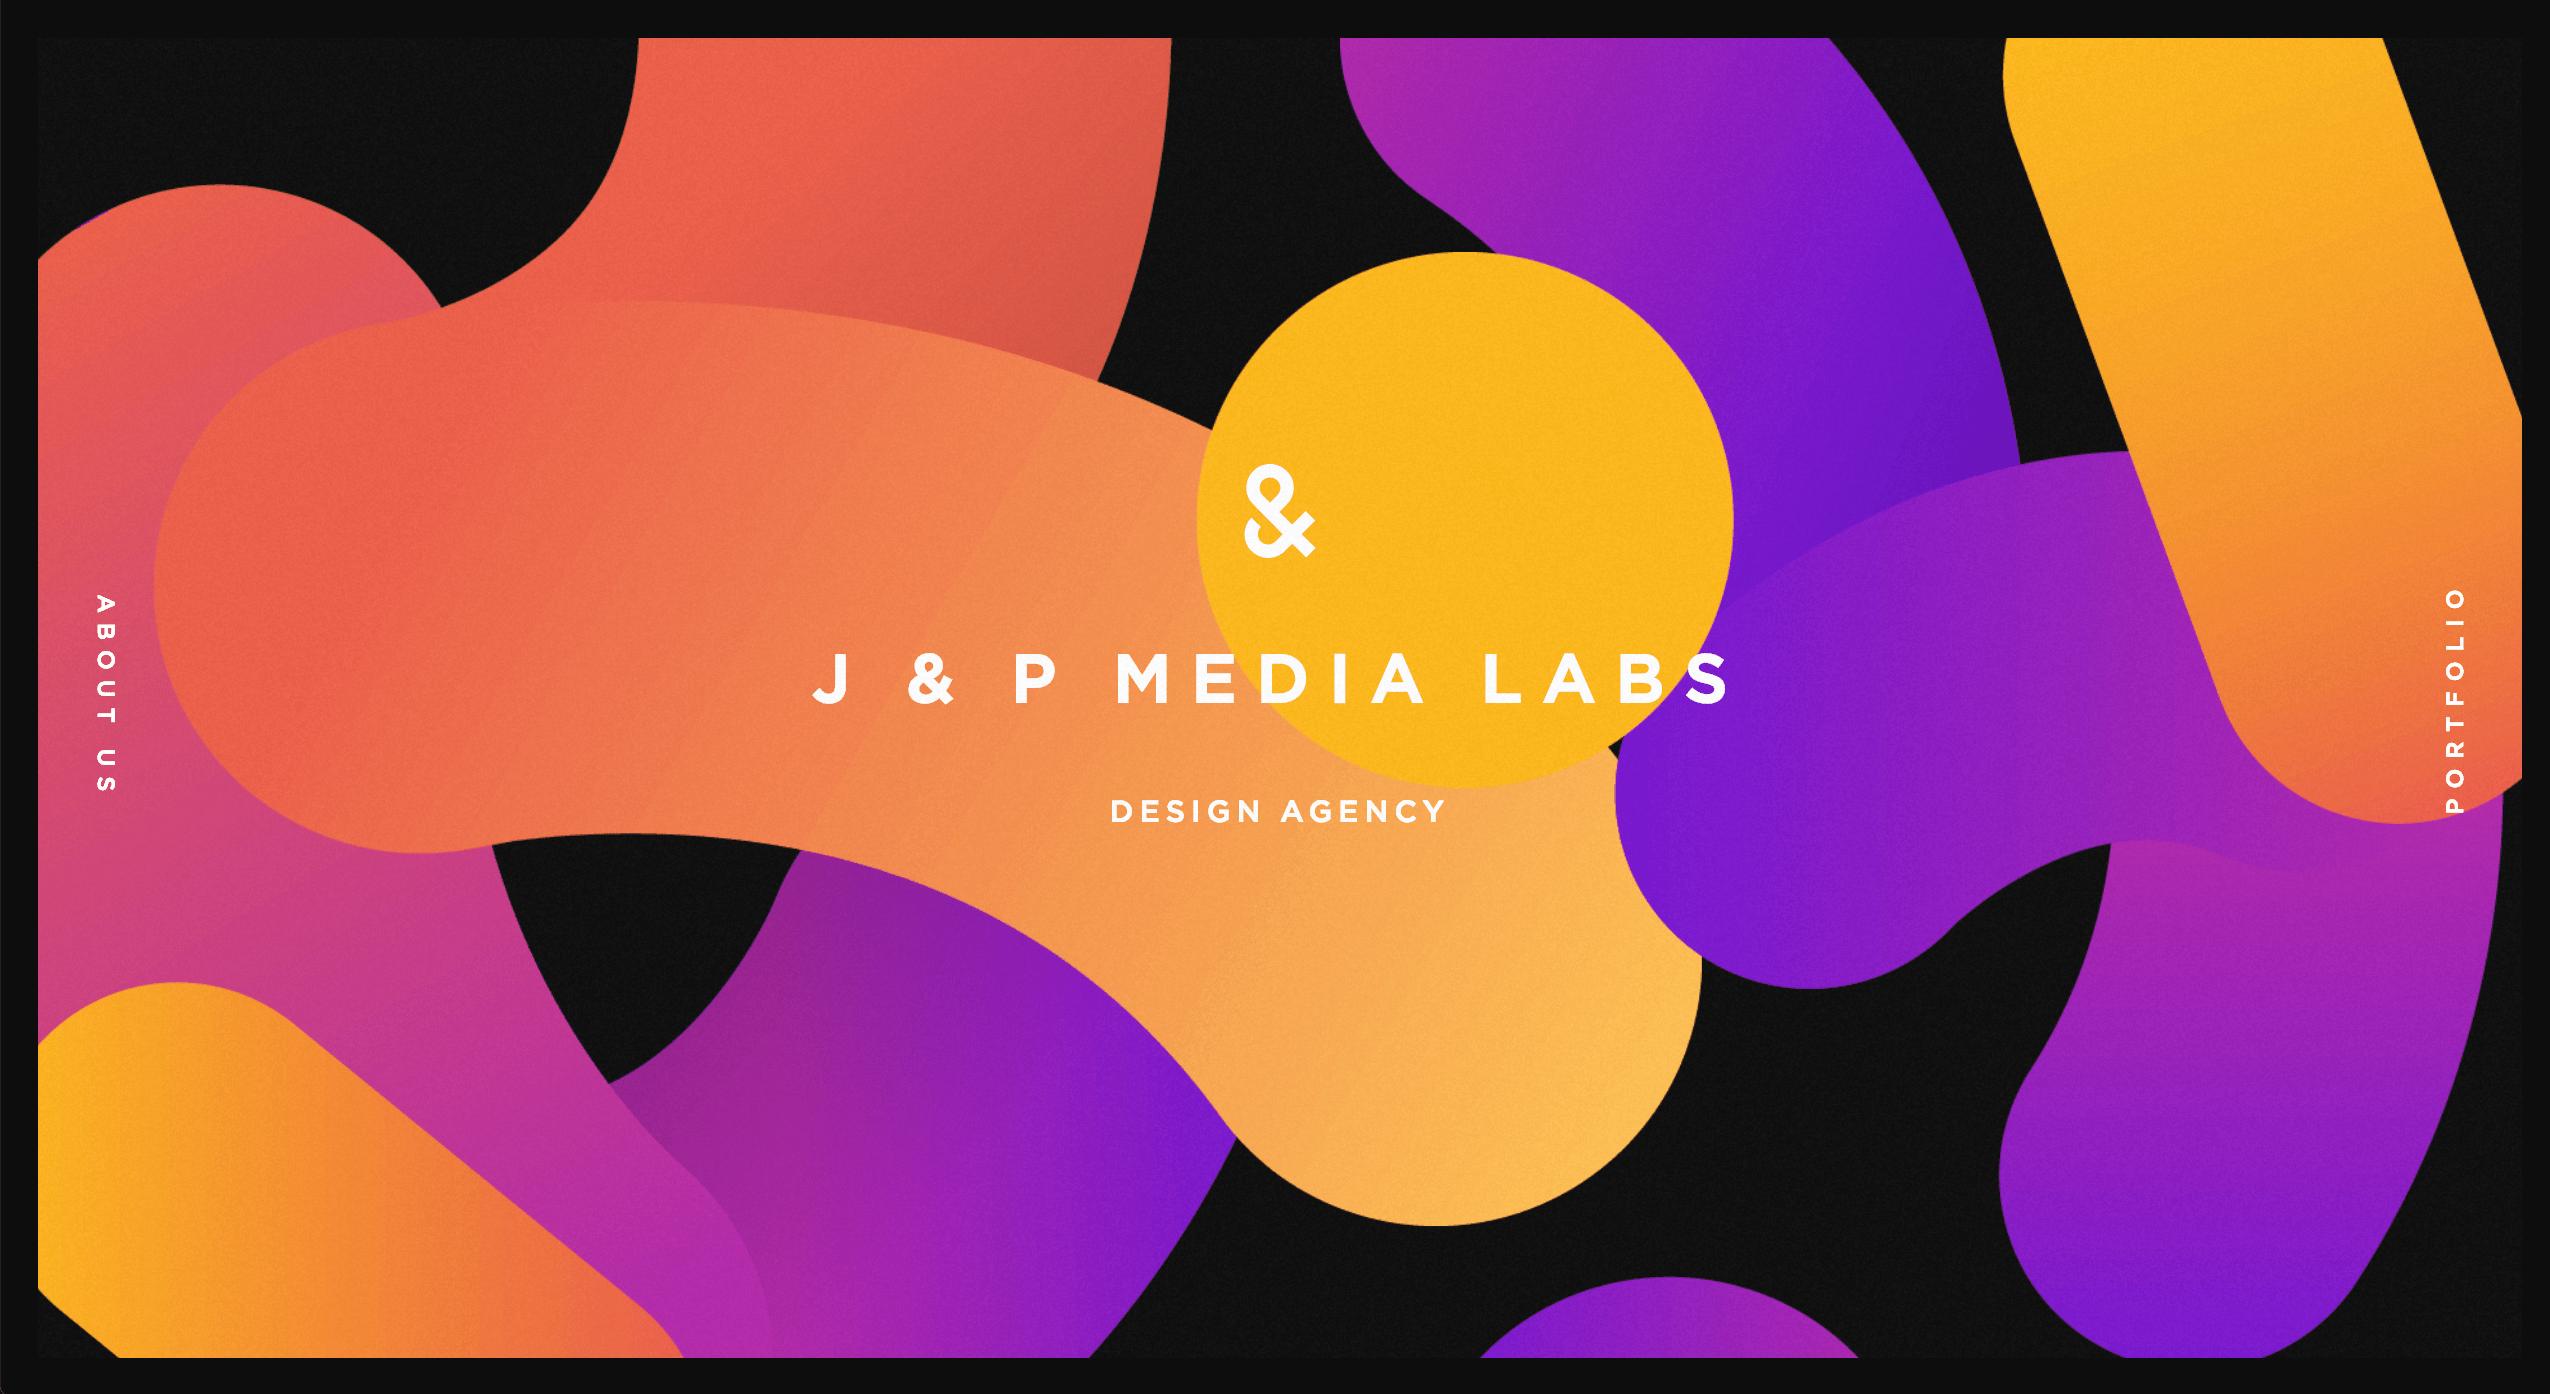 J & P Media Labs-1